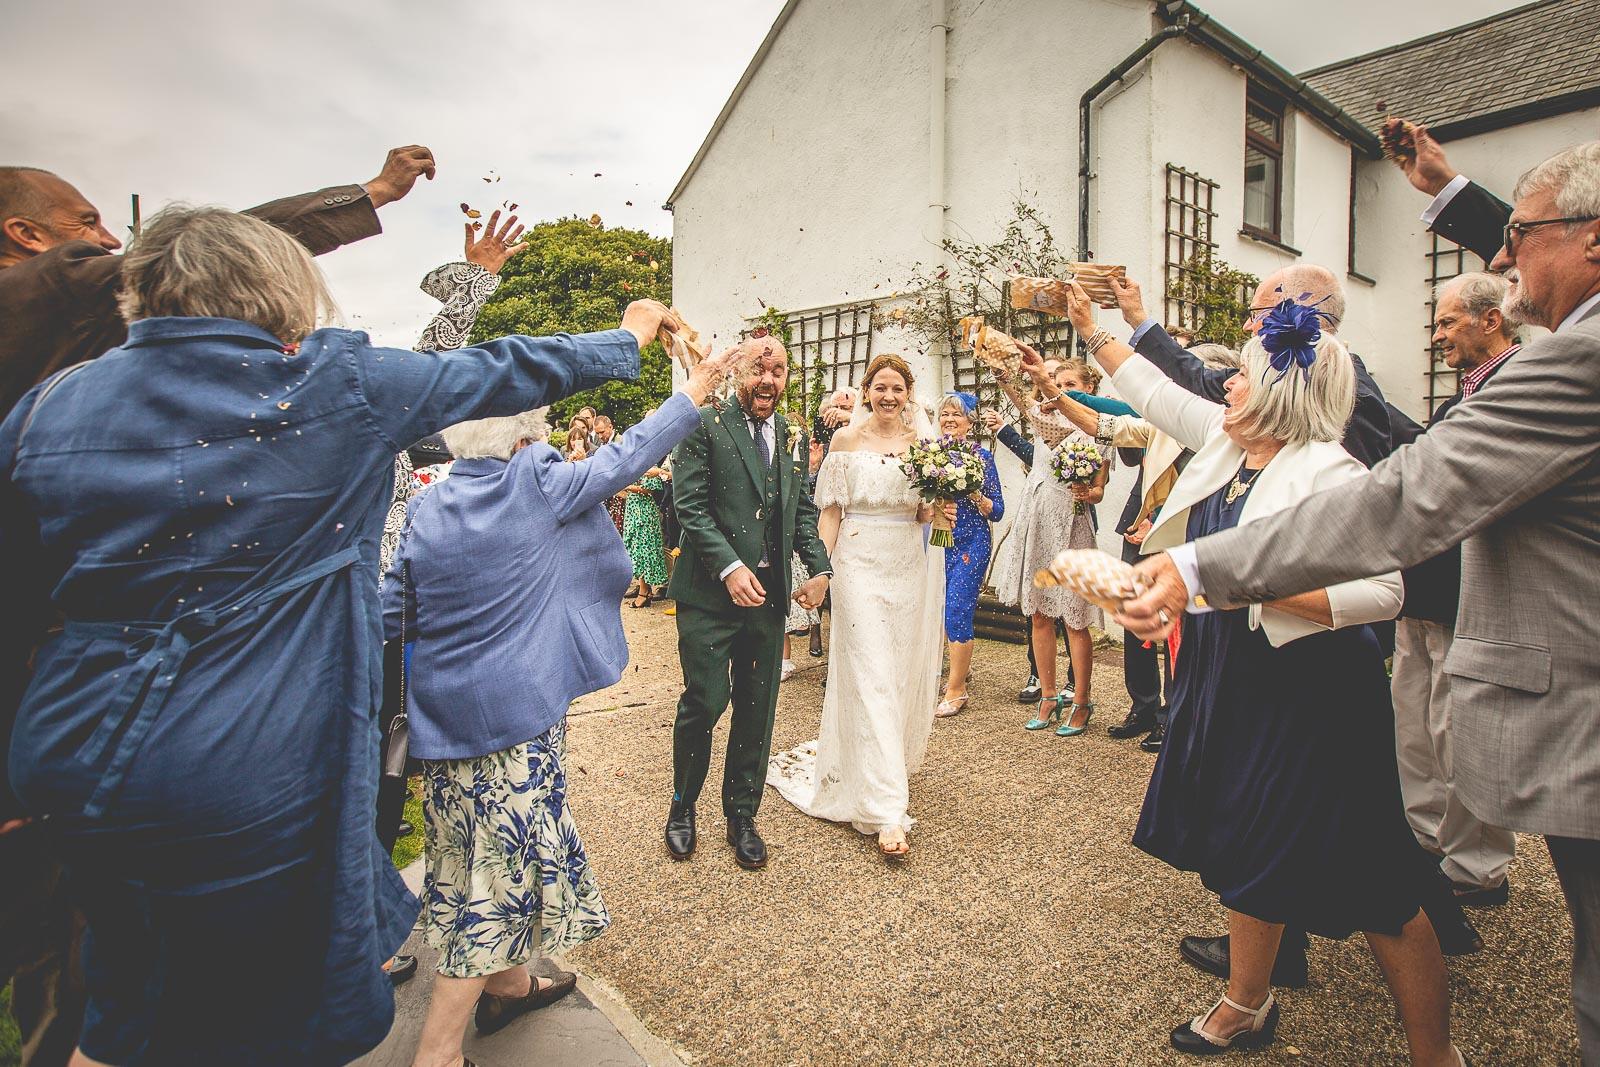 the old barn - clovelly - ugotthelove - wedding photography-6897.jpg